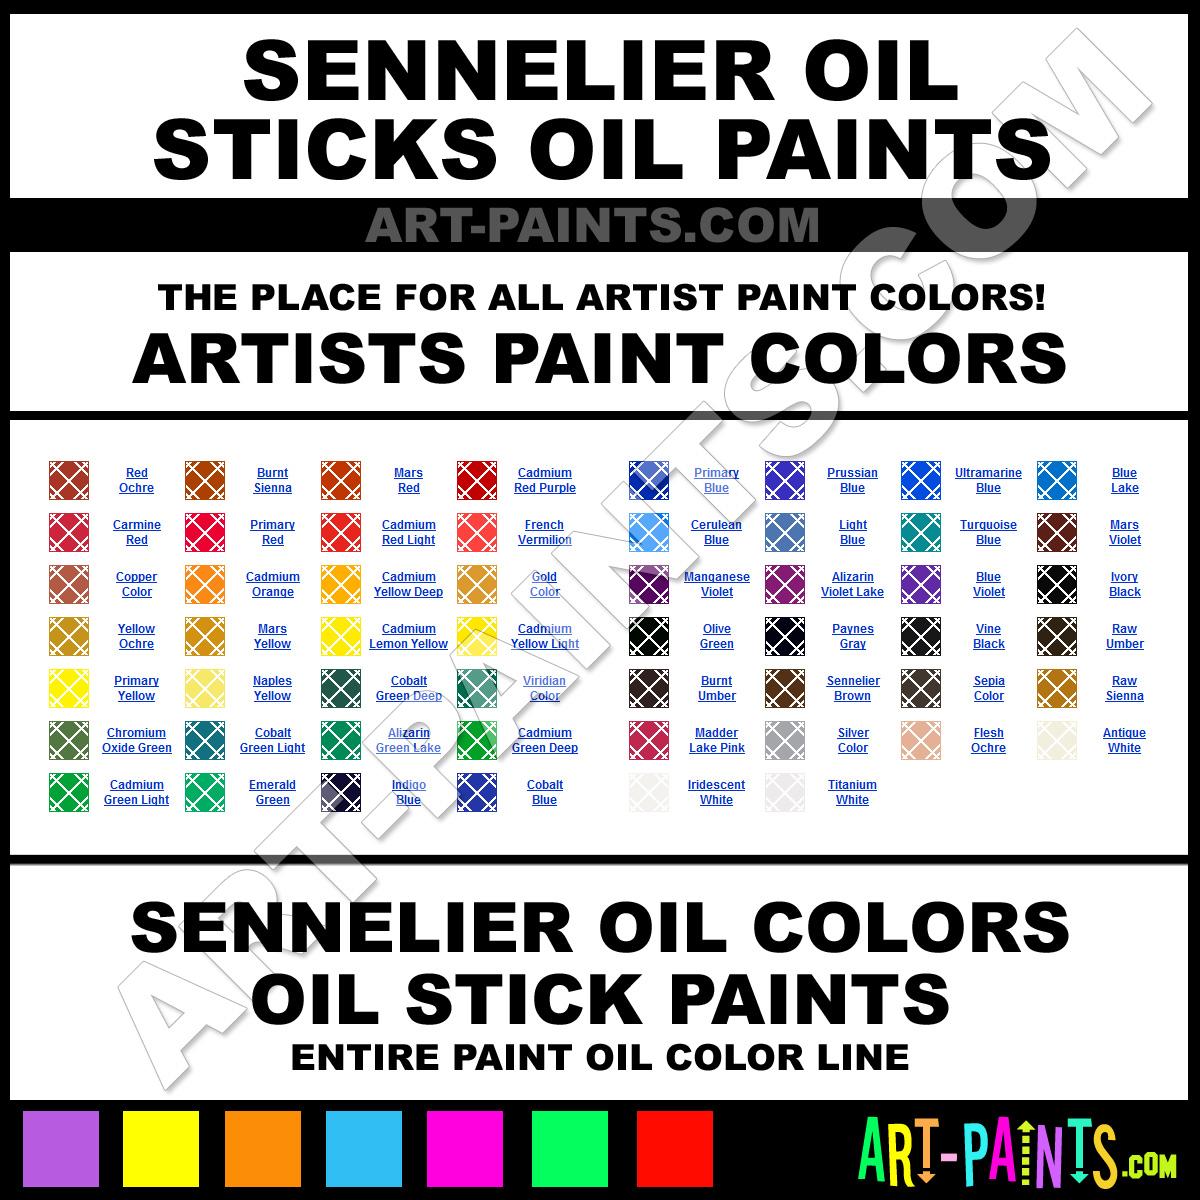 Sennelier oil sticks oil paint colors sennelier oil for Will oil paint stick to glass